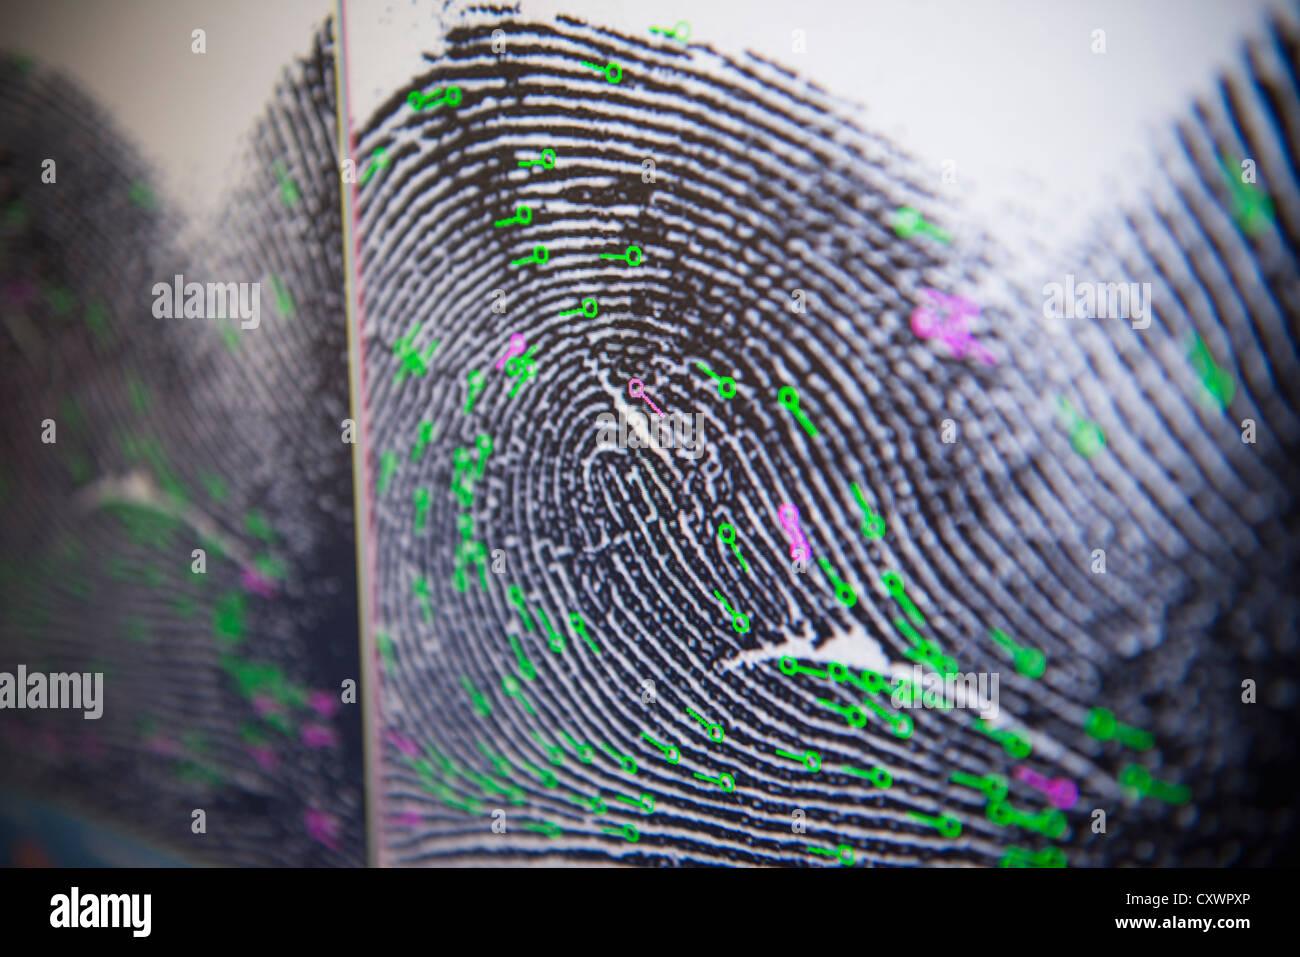 Fingerprint on screen in forensic lab - Stock Image